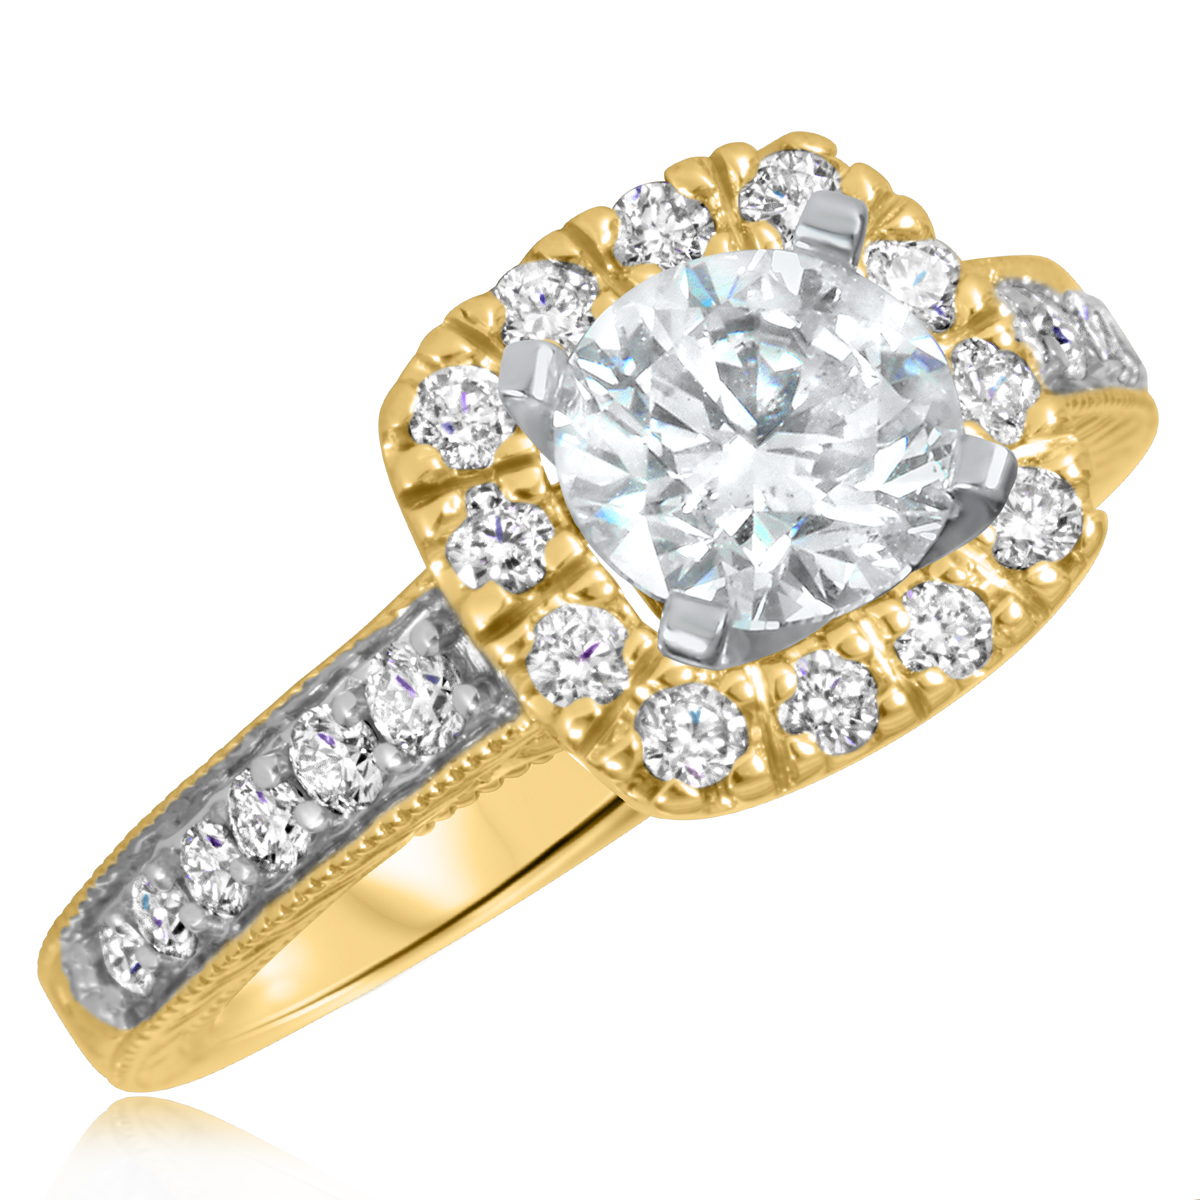 1 1/2 CT. T.W. Diamond Ladies Engagement Ring 14K Yellow Gold- Size 8